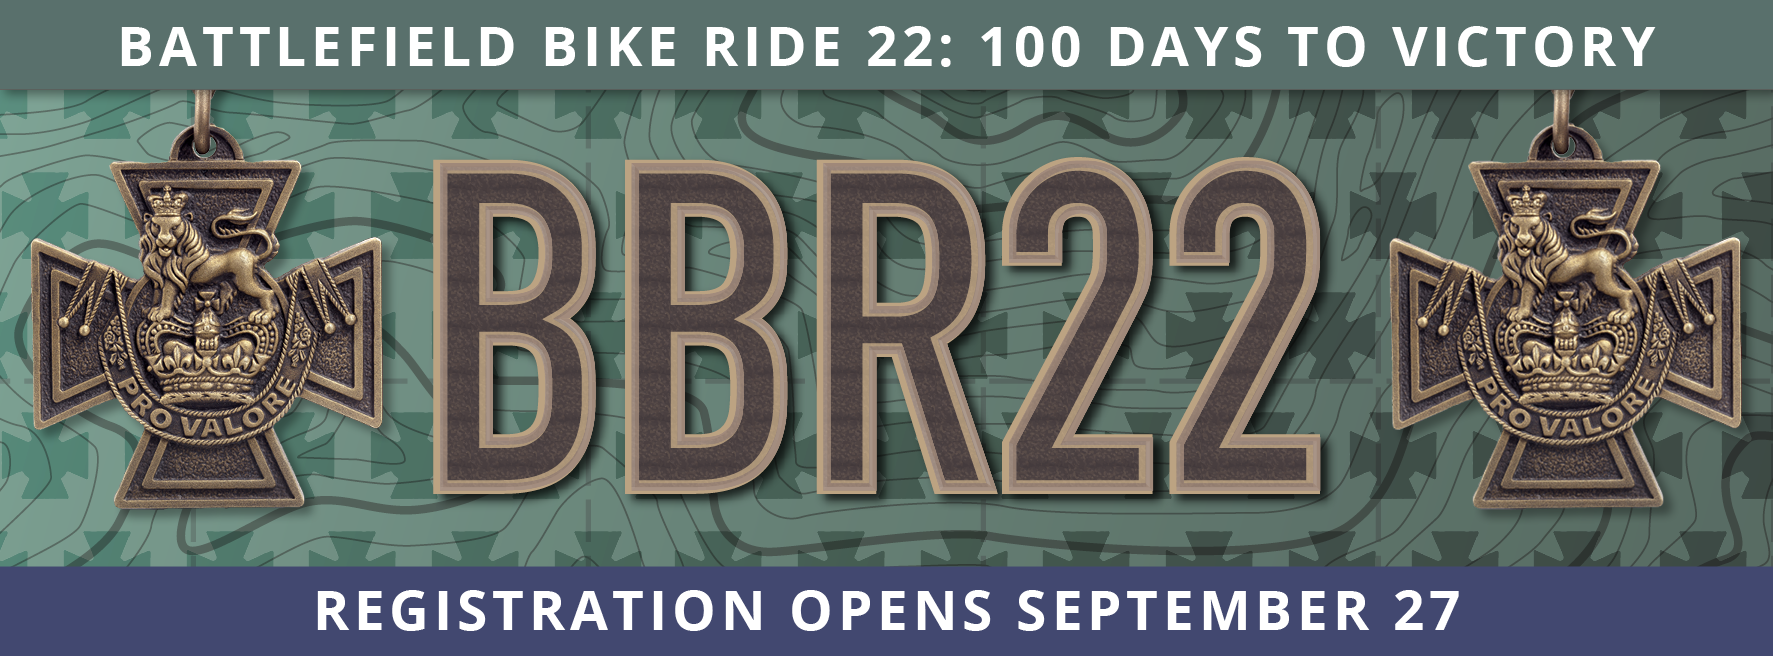 Battlefield Bike Ride 22: 100 Days to Victory